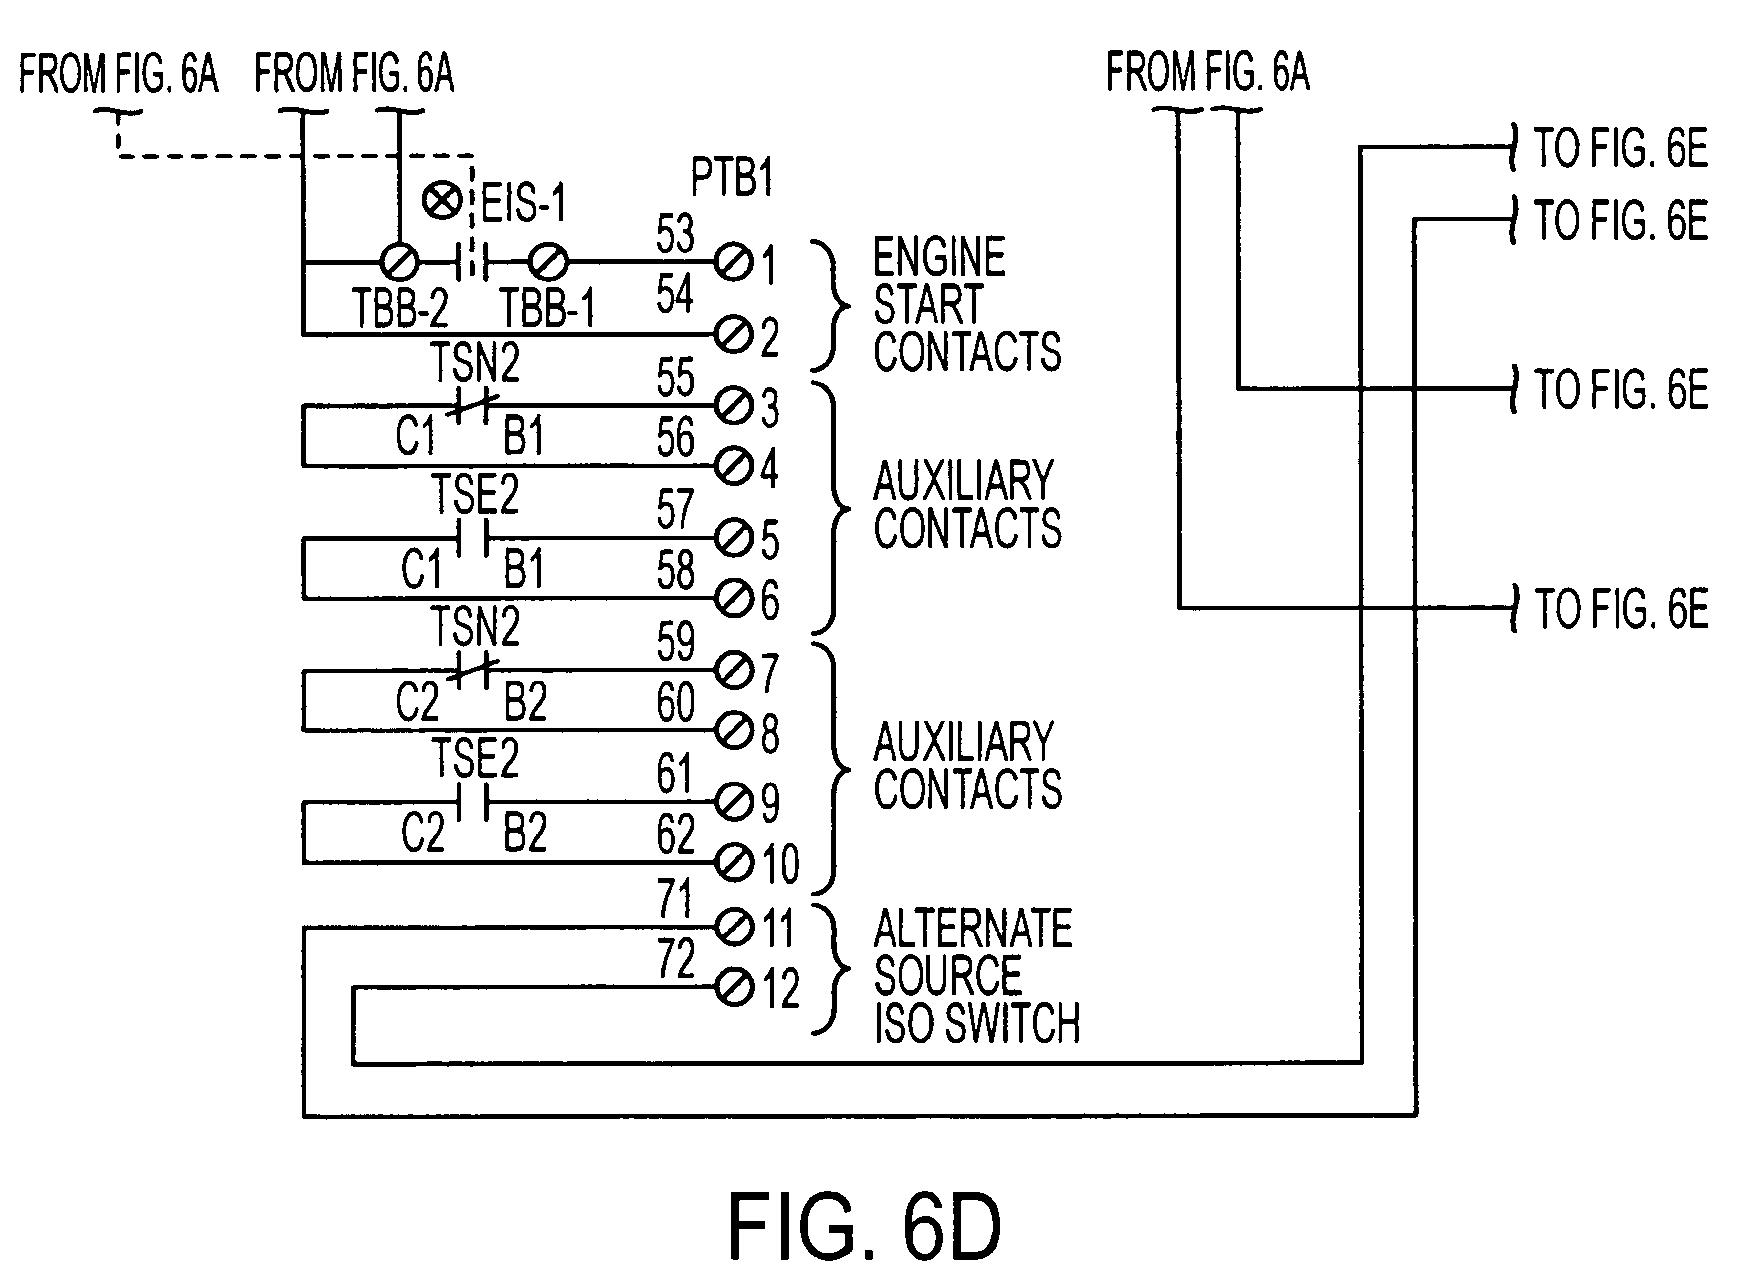 fire pump wiring diagram 1966 mustang under dash transfer switch